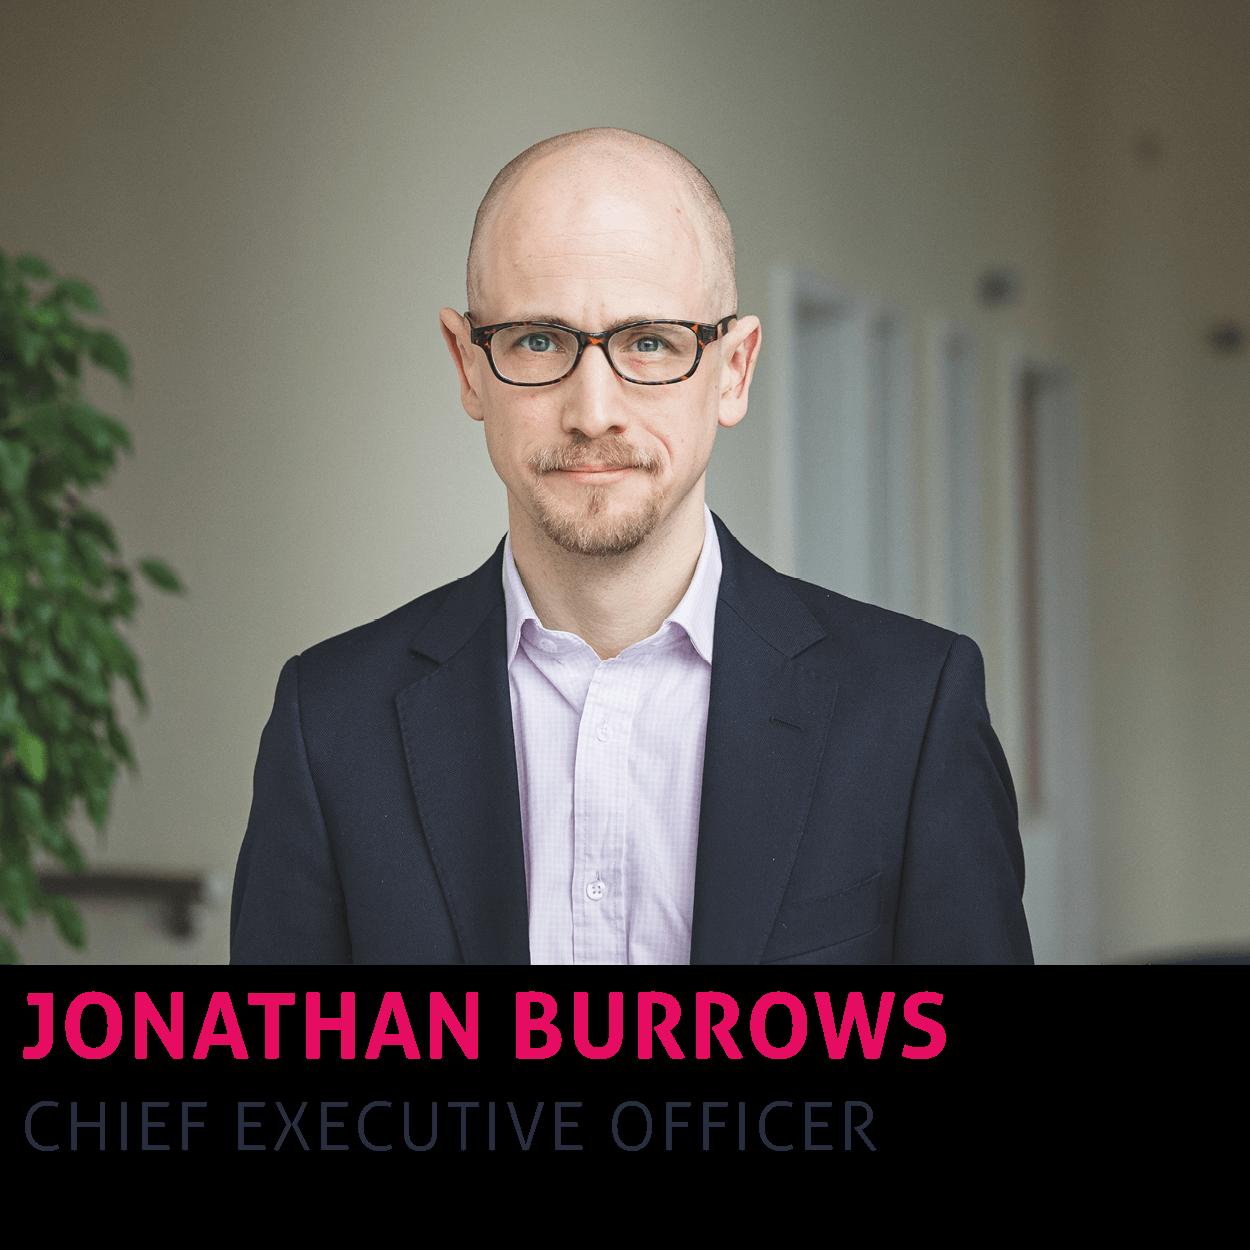 Jonathan Burrows, Chief Executive Officer